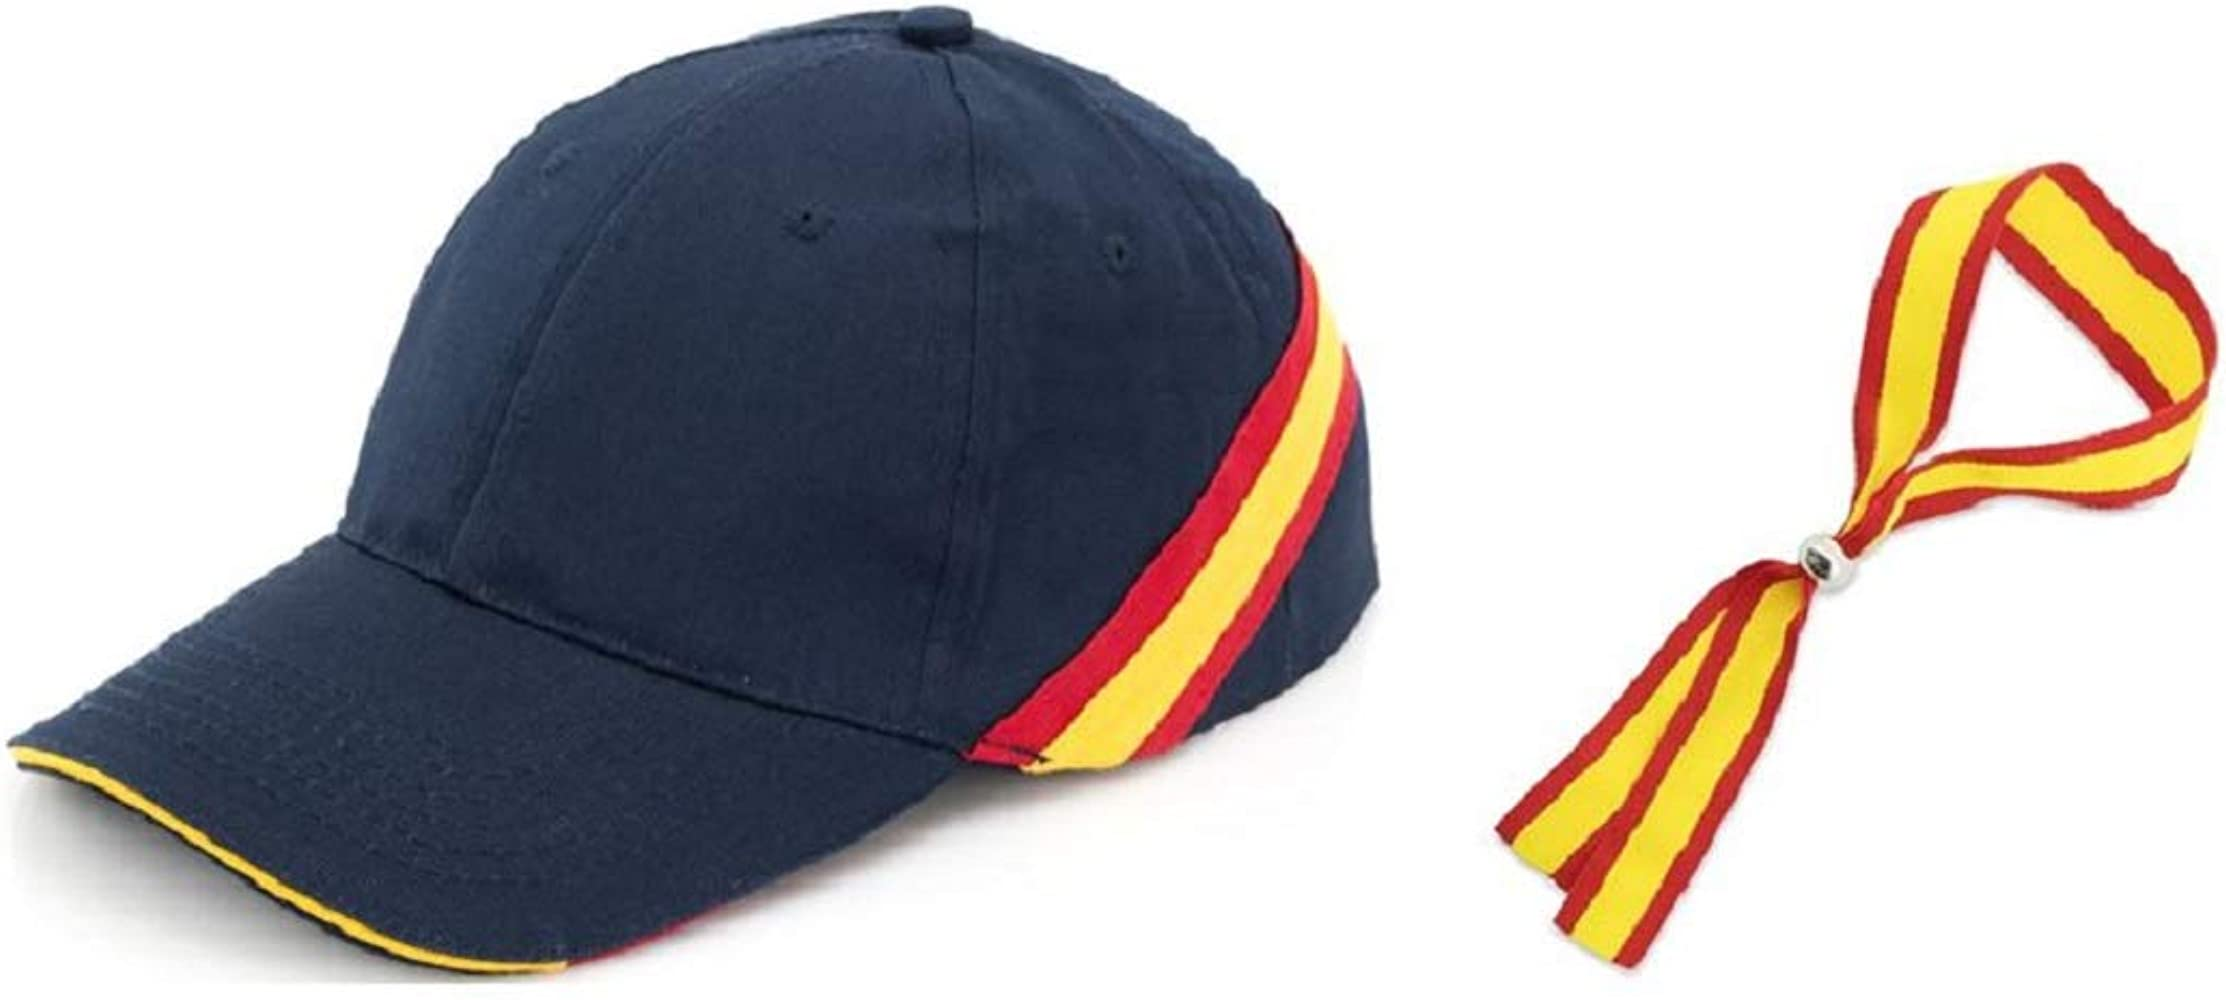 crisandecor Gorra Azul Bandera ESPAÑA con Regalo Pulsera ESPAÑA: Amazon.es: Ropa y accesorios